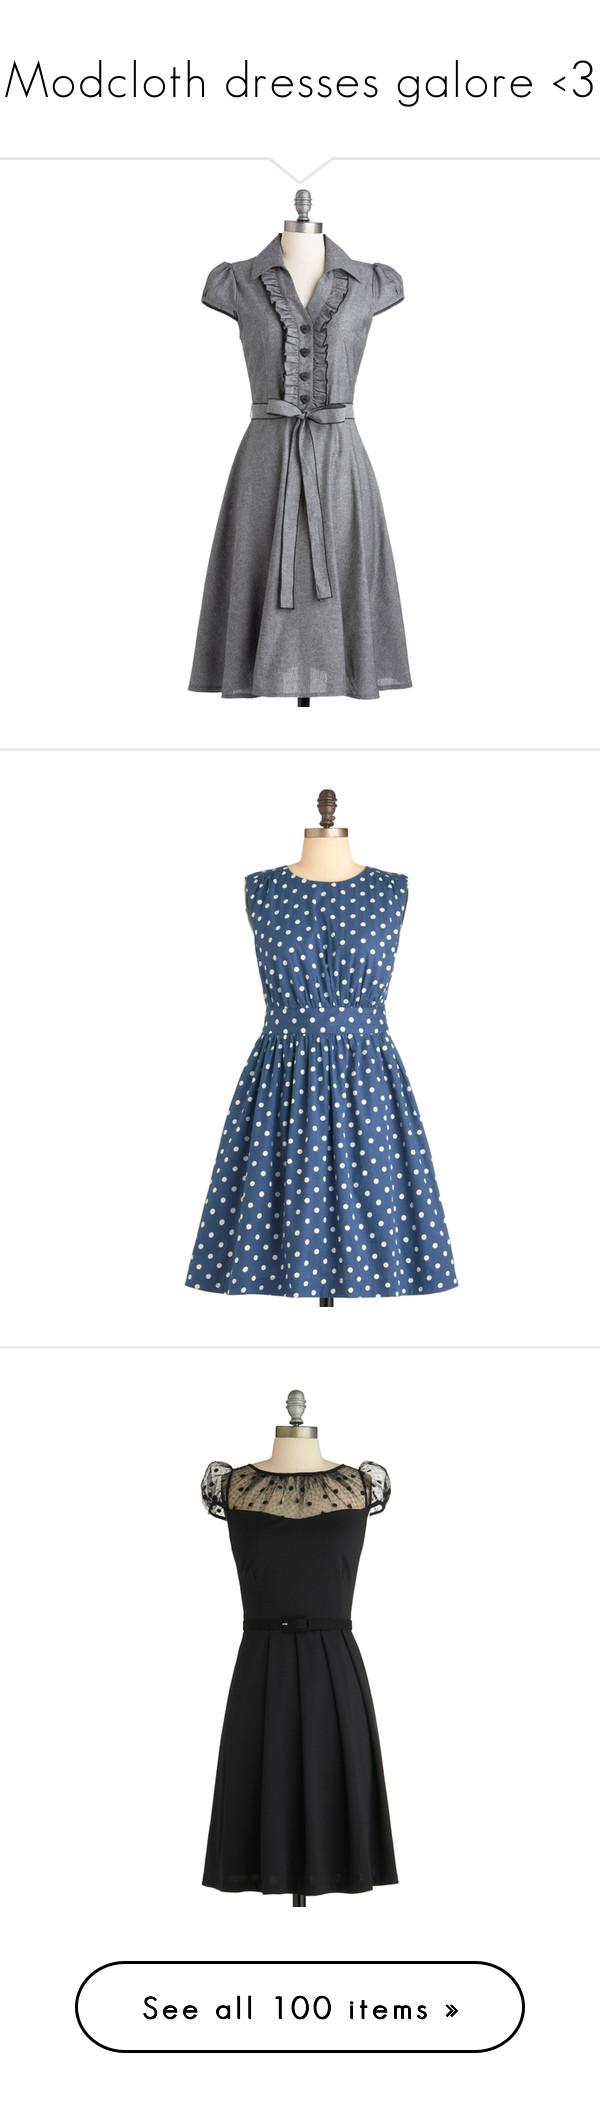 Modcloth dresses galore uc